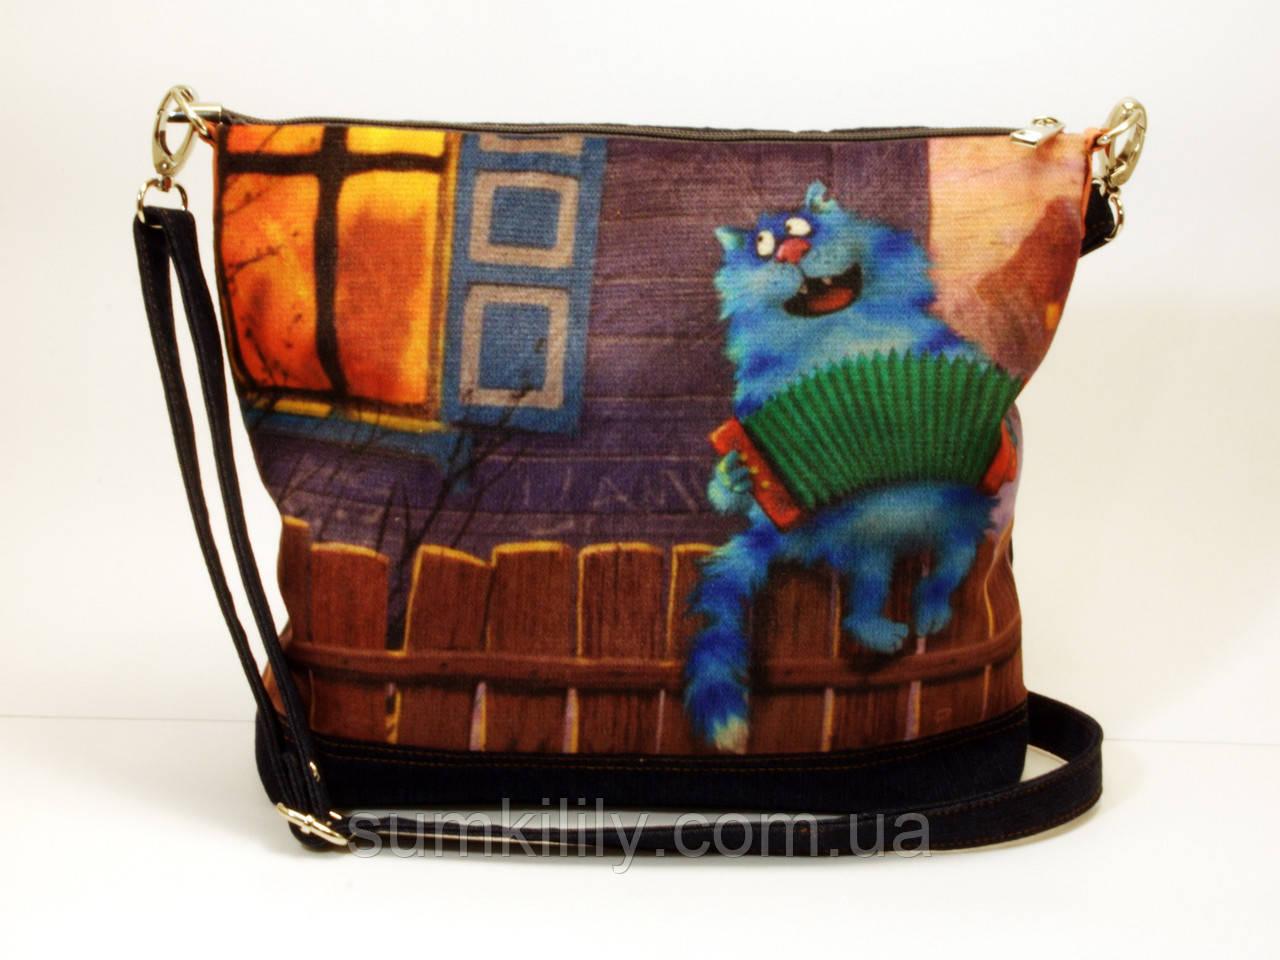 Женская сумочка Серенады